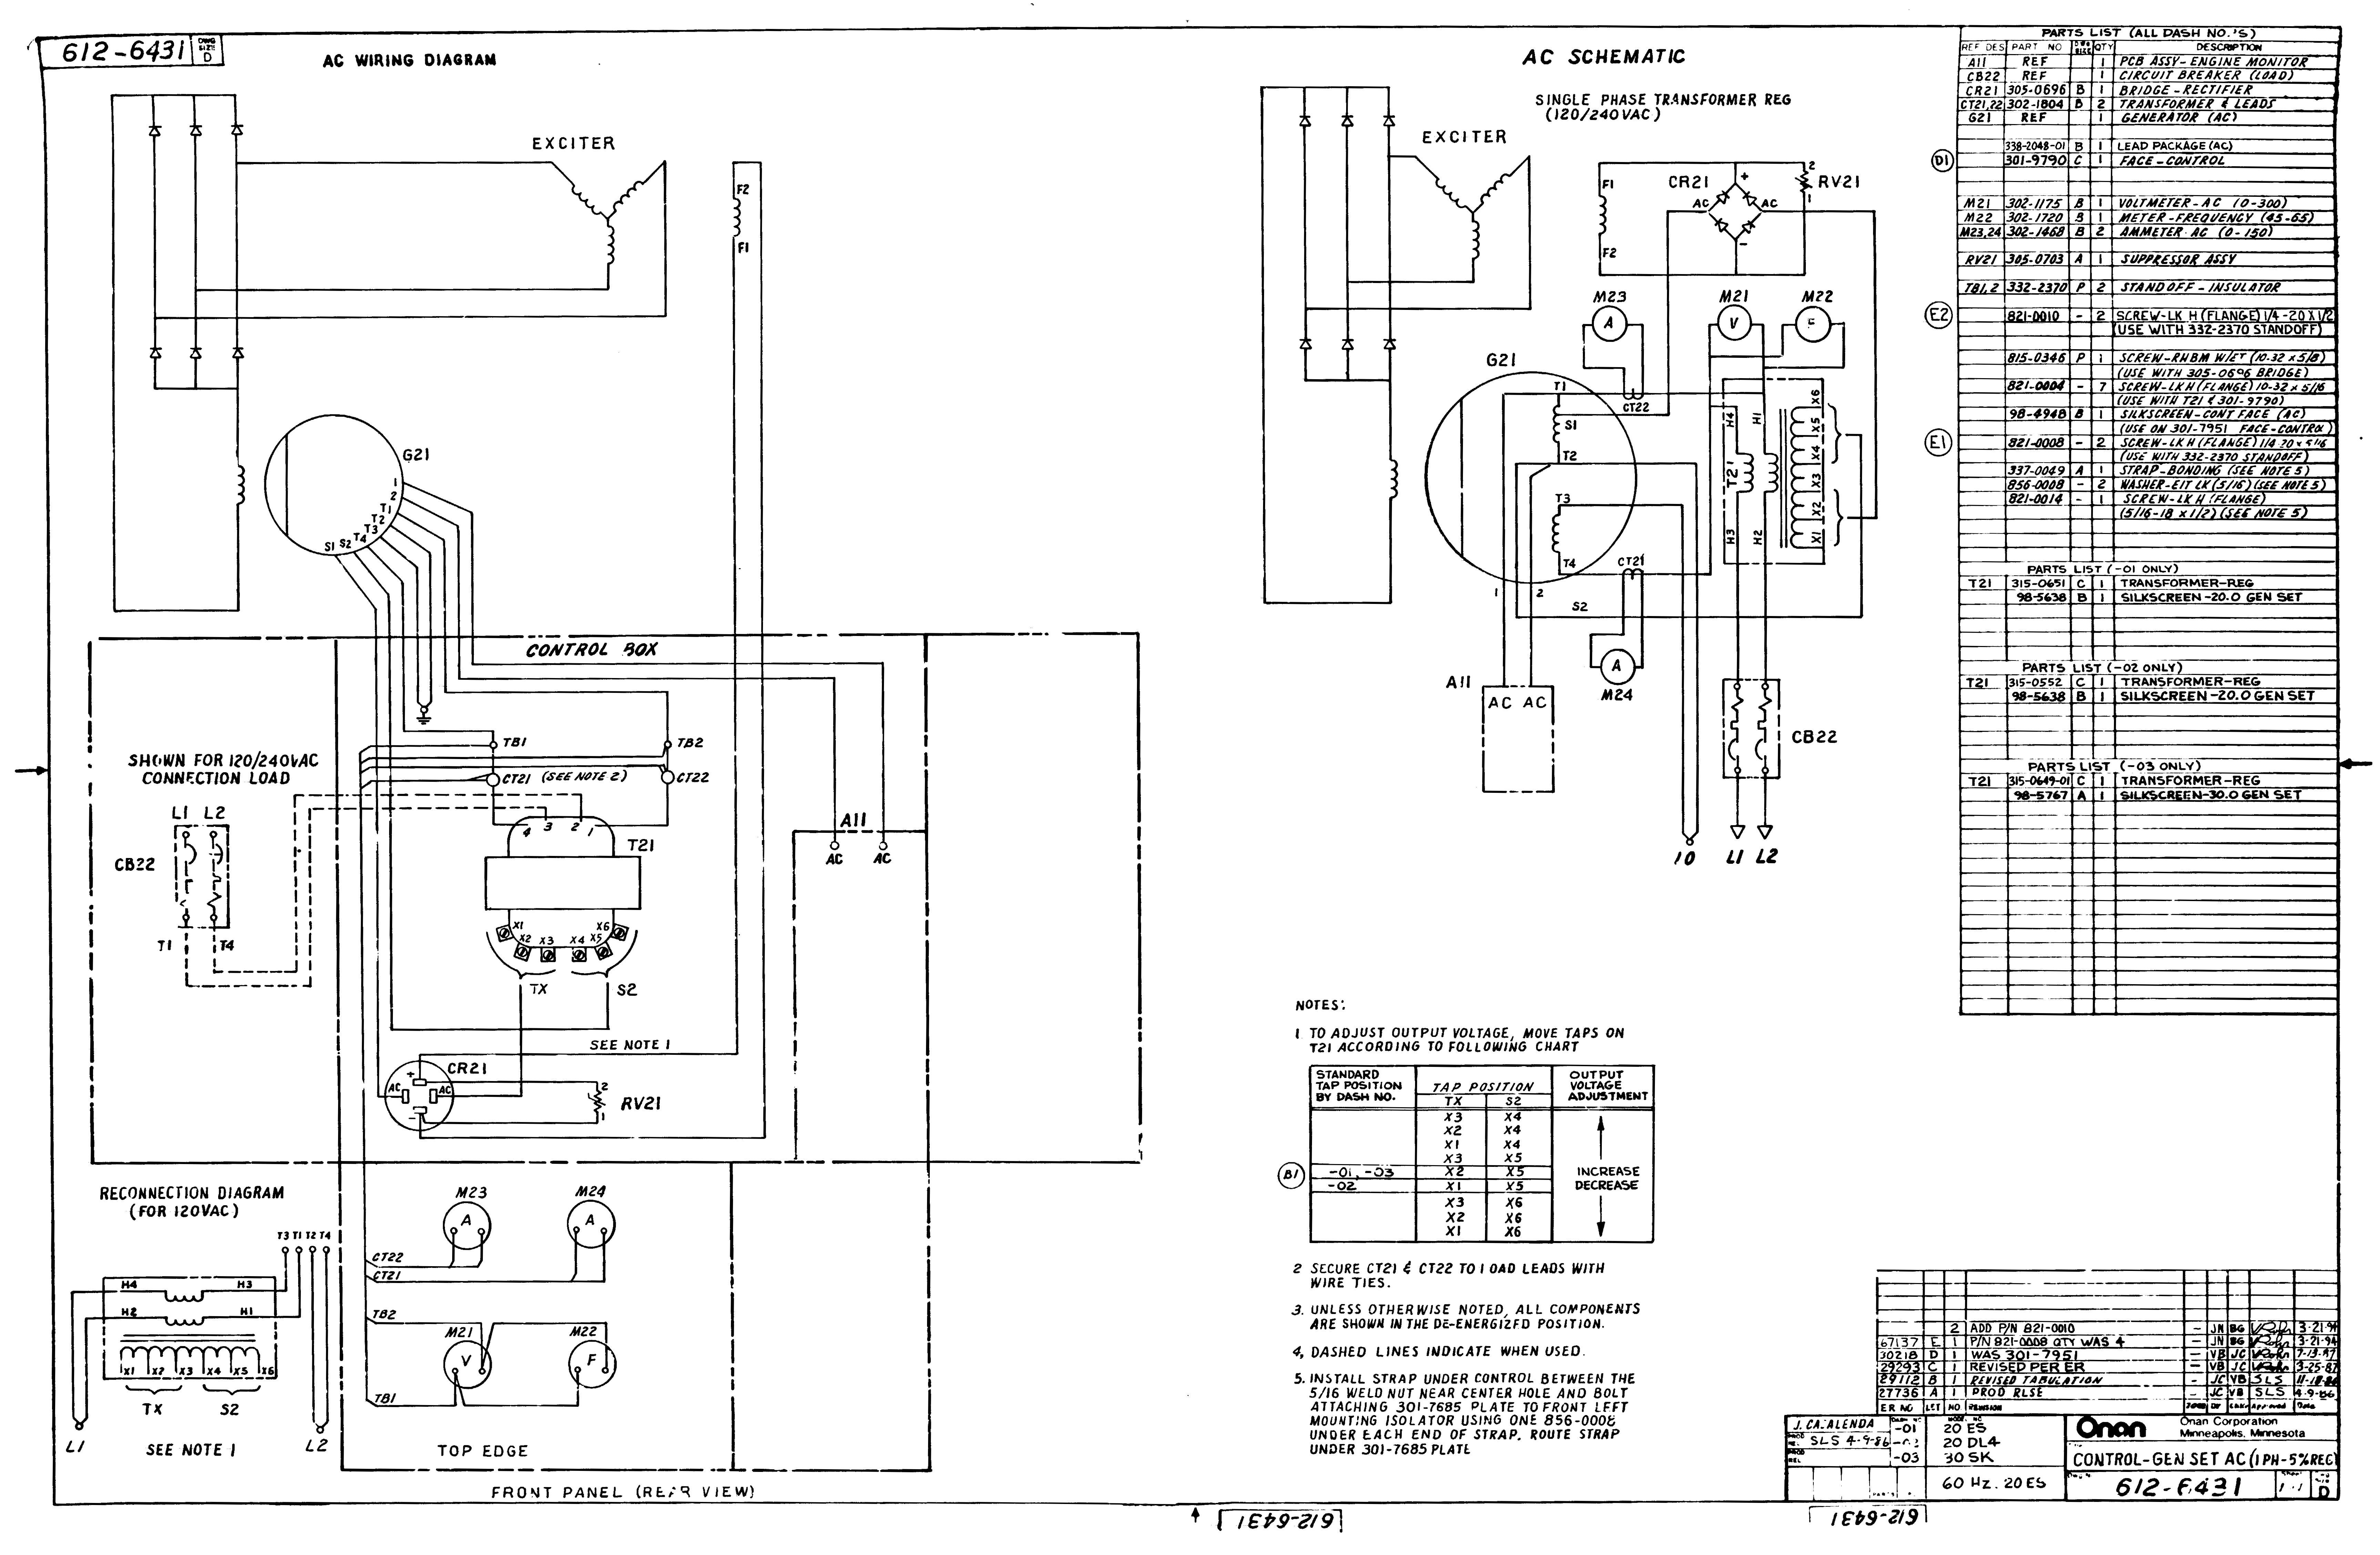 Alternator Parts Diagram Wiring Diagram for Rv Generator New Generator Wiring Diagram Best Of Alternator Parts Diagram Alternator Wiring Diagram Image